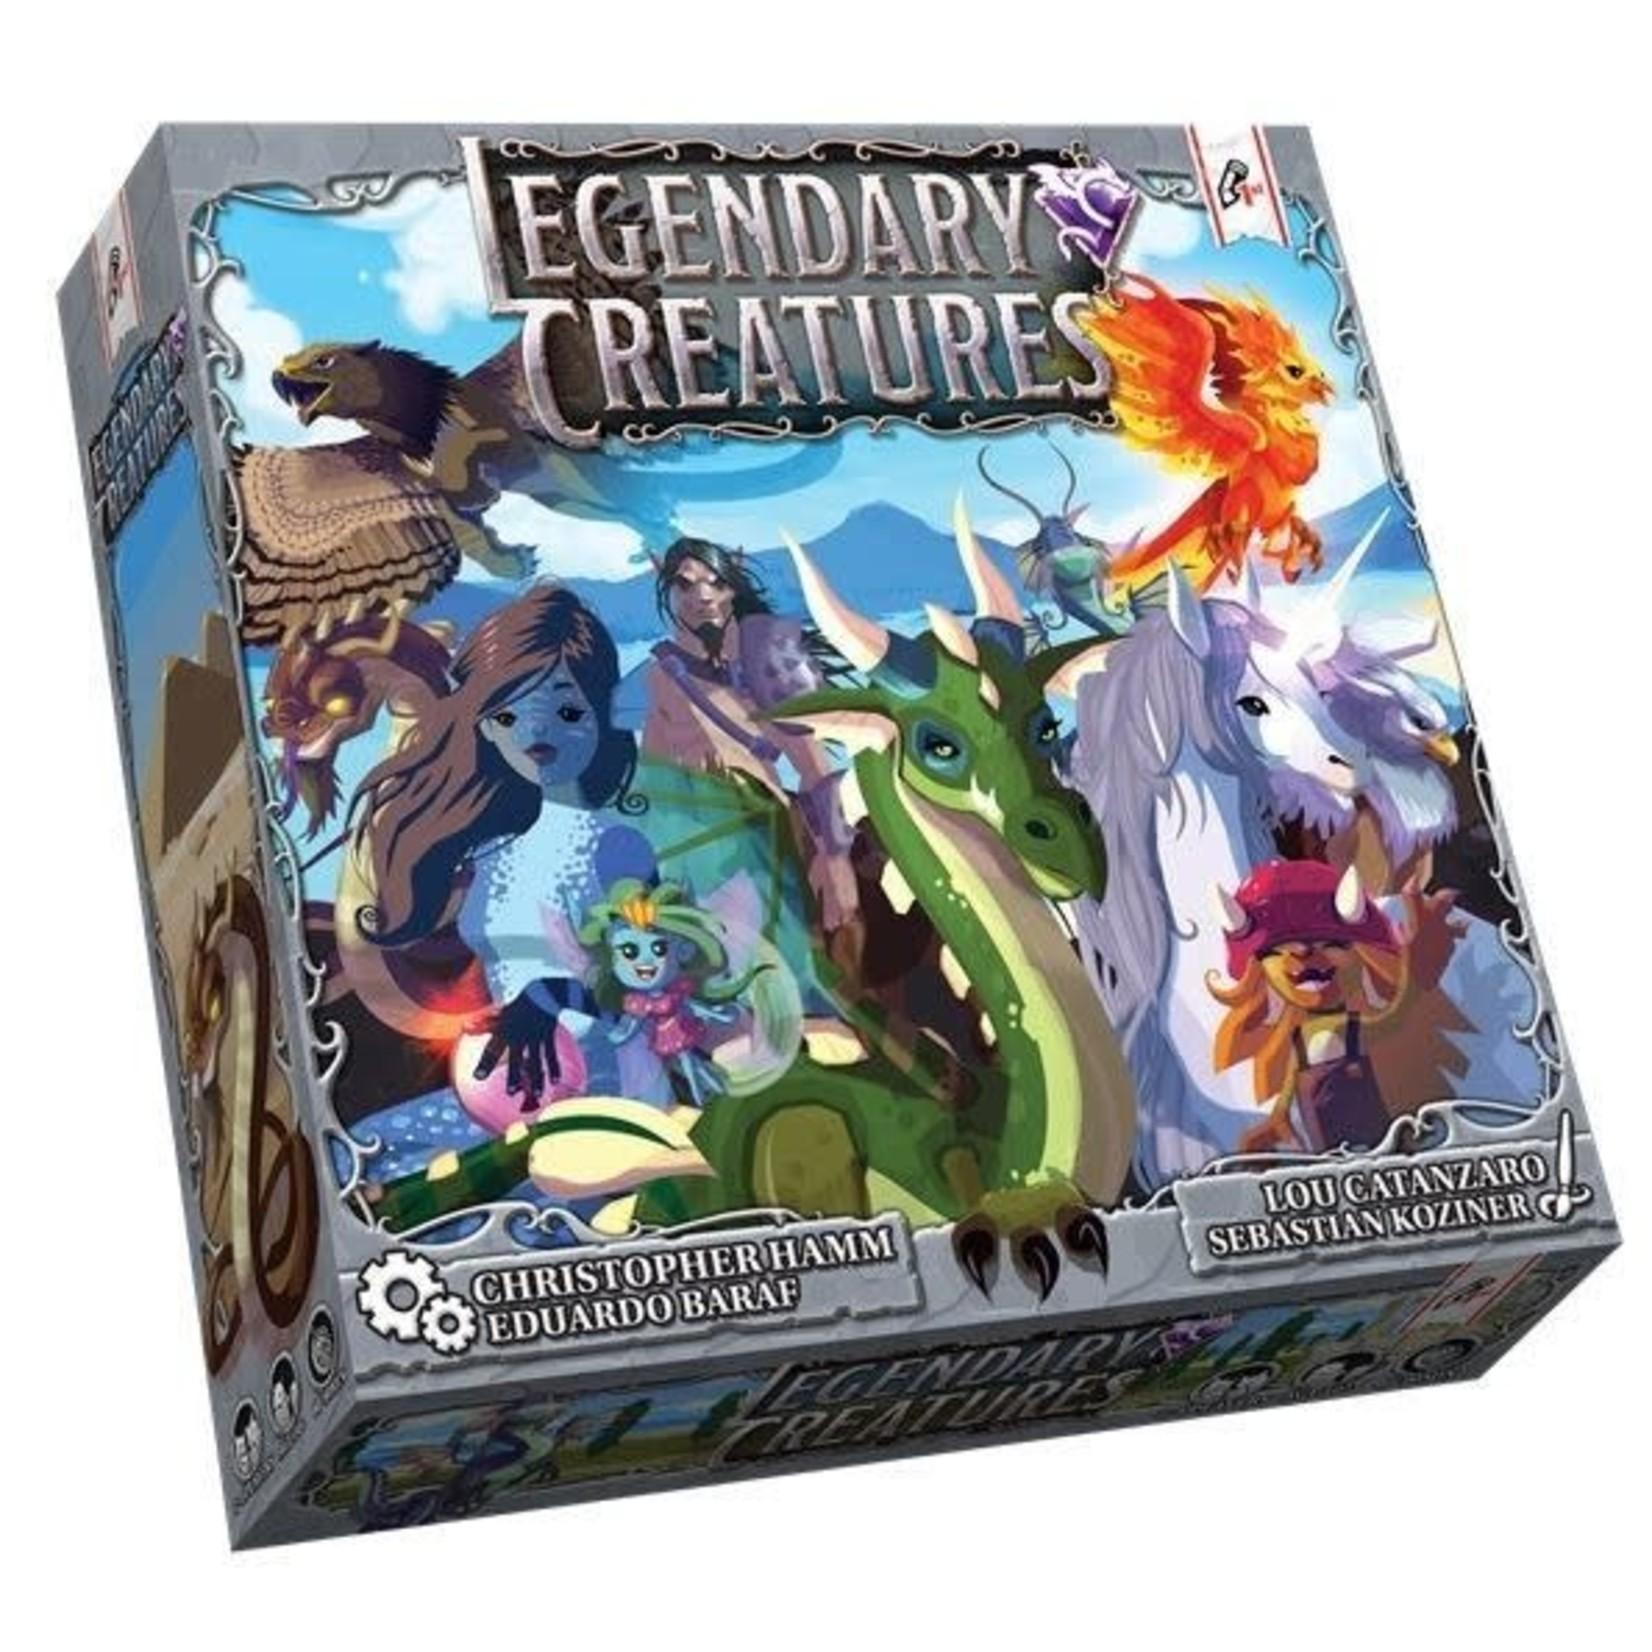 Legendary Creatures Board Game